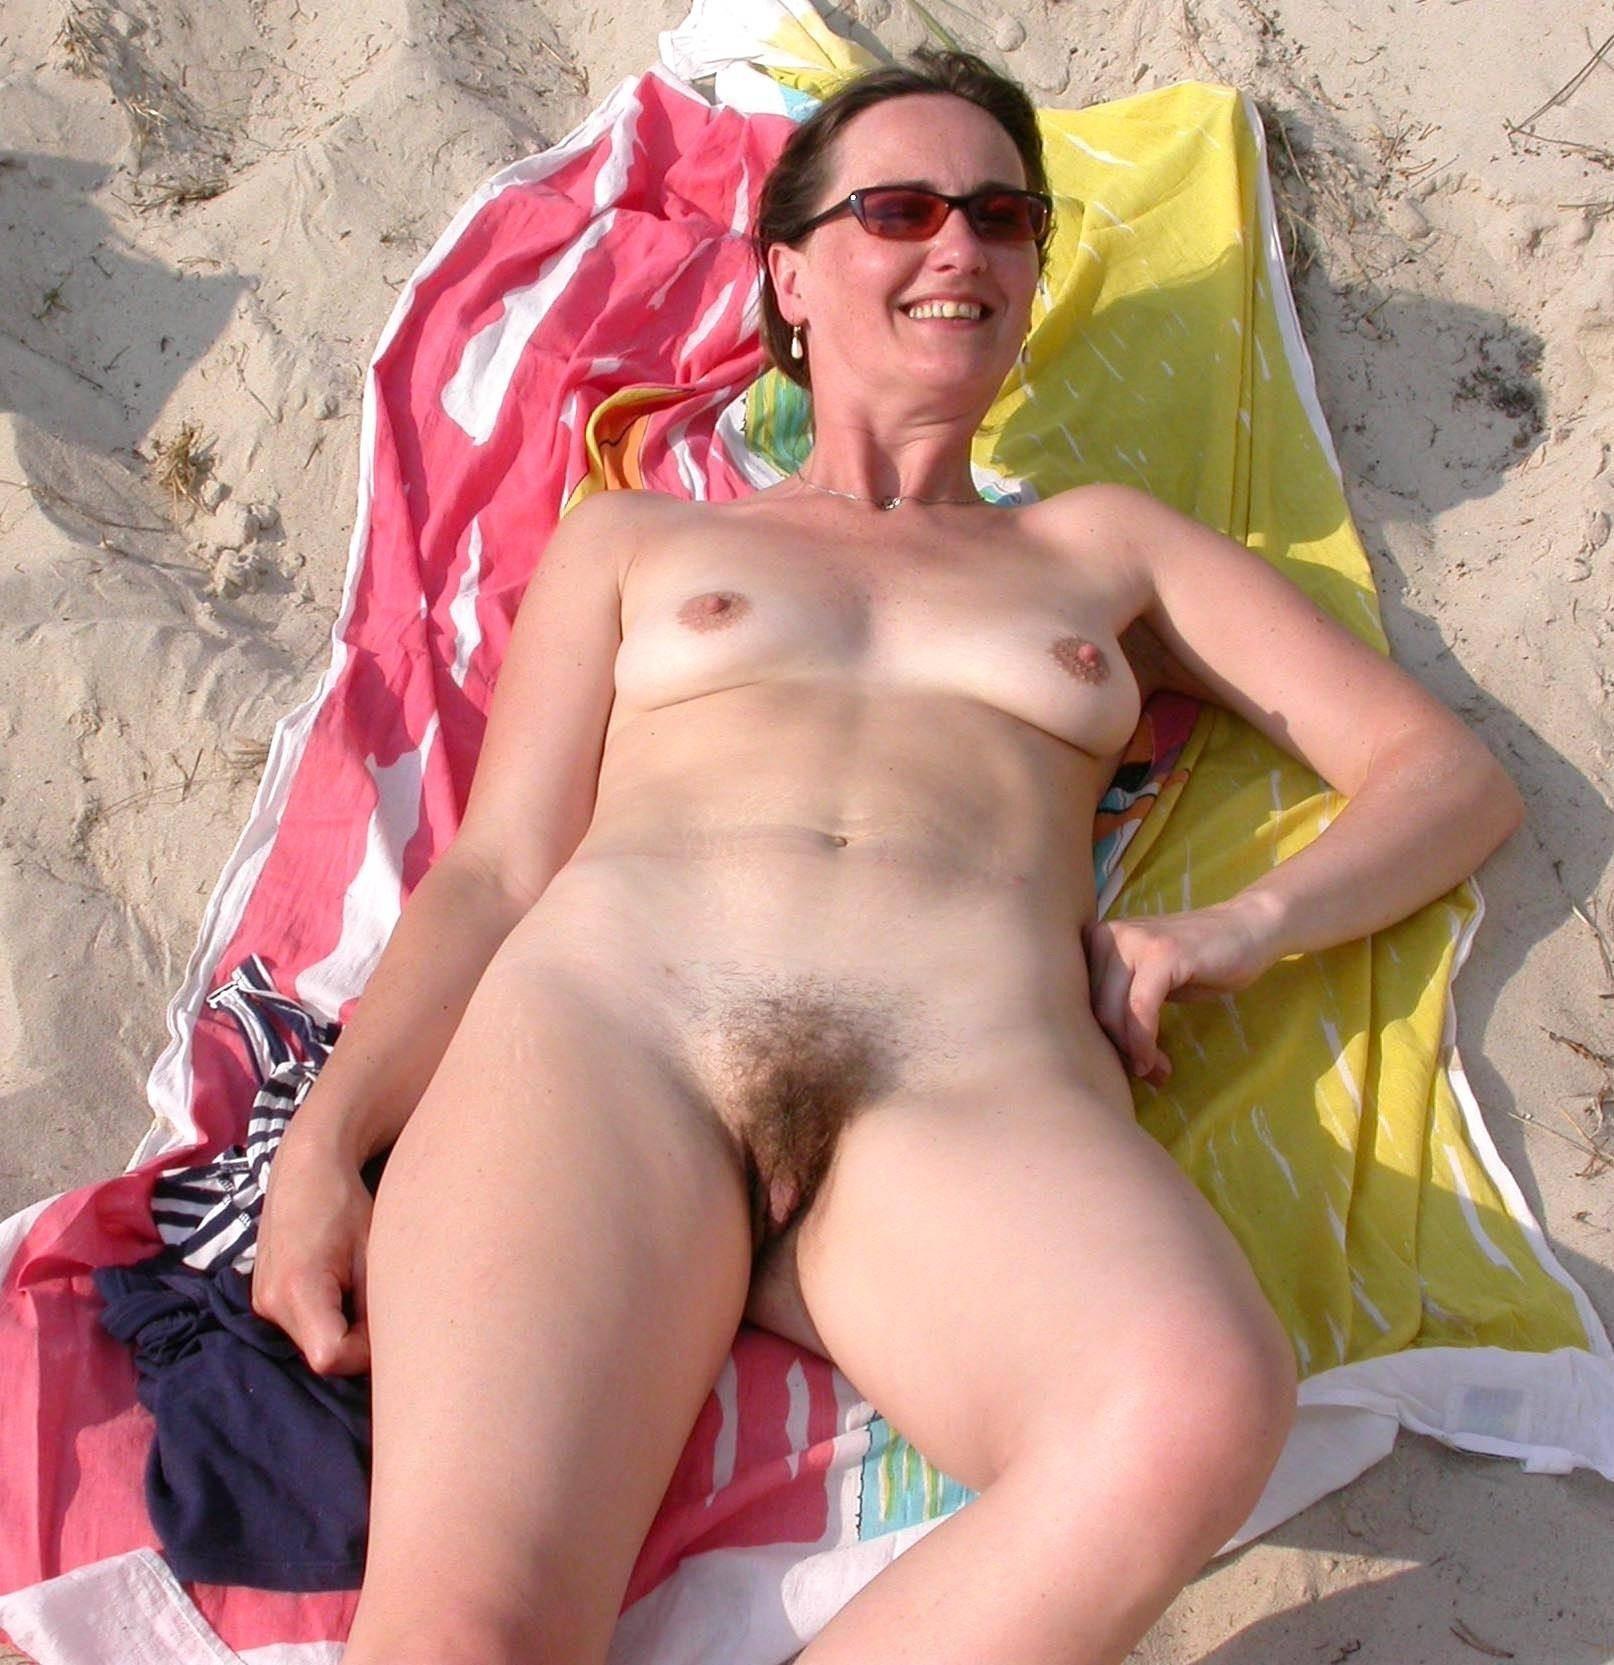 older-voyeur-south-carolina-nude-cute-ass-asian-touch